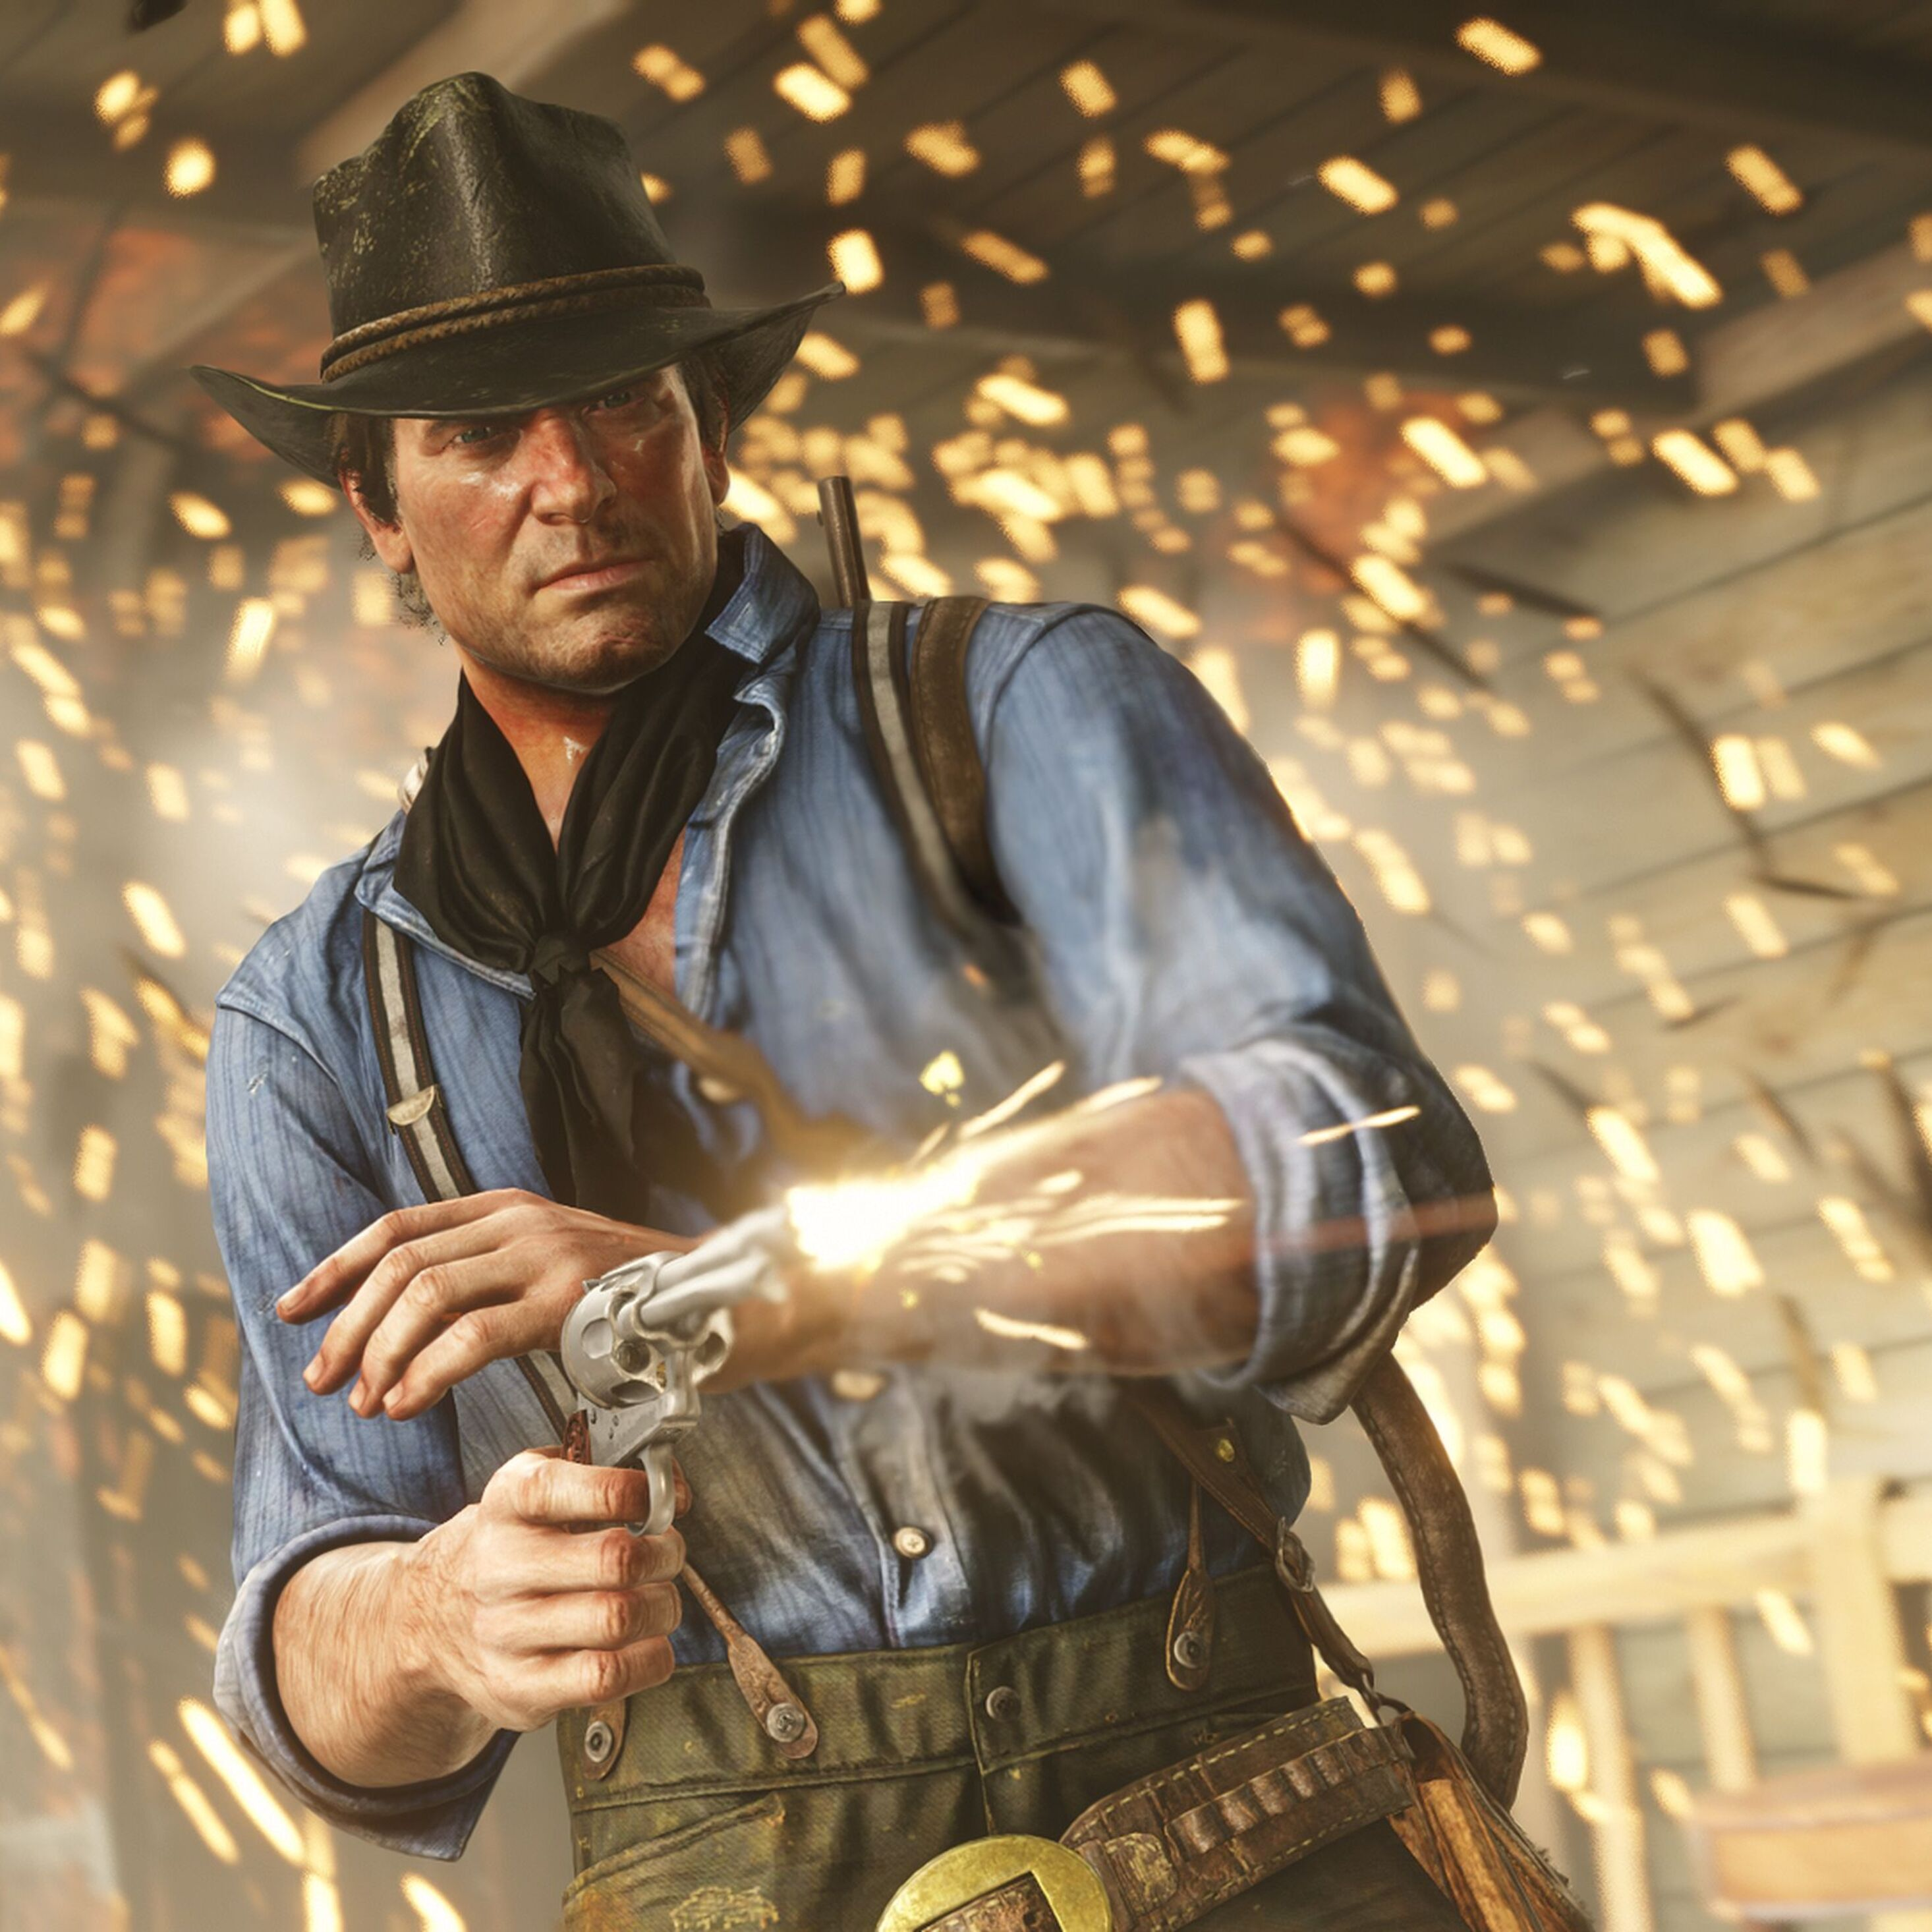 Red Dead Redemption Wallpaper Hd: 2932x2932 Red Dead Redemption 2 Arthur Morgan Ipad Pro